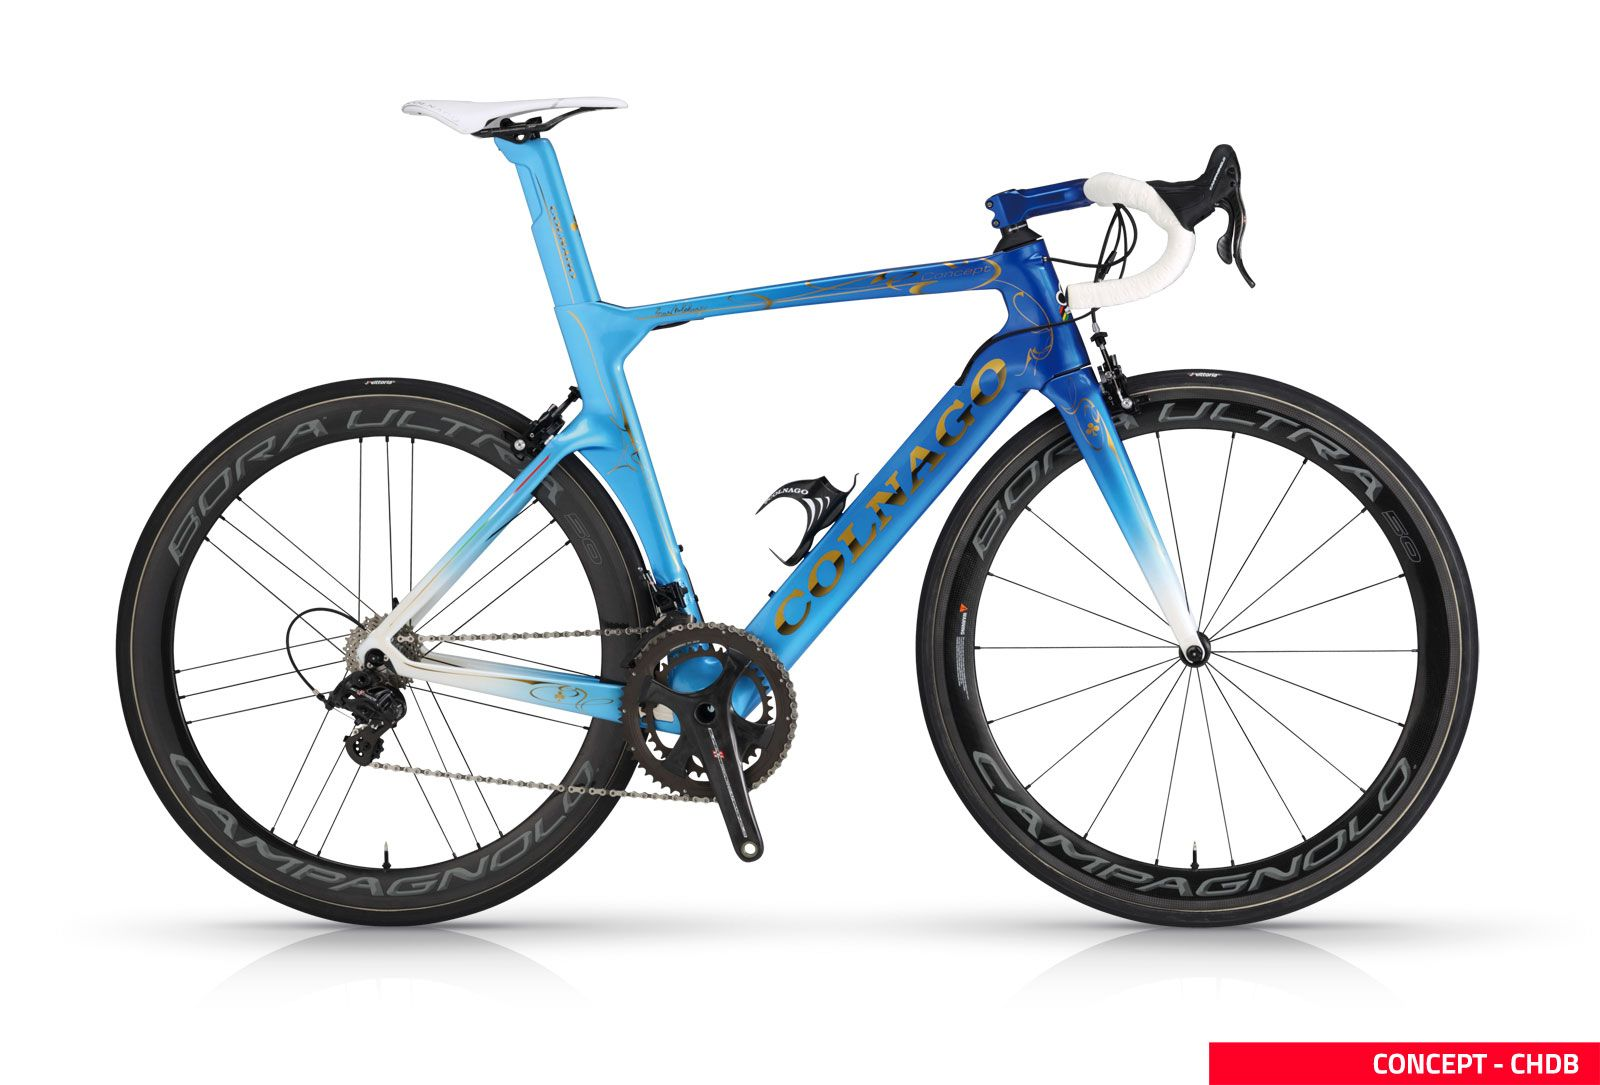 Bicicletta da strada Concept Bicicletta, Bici